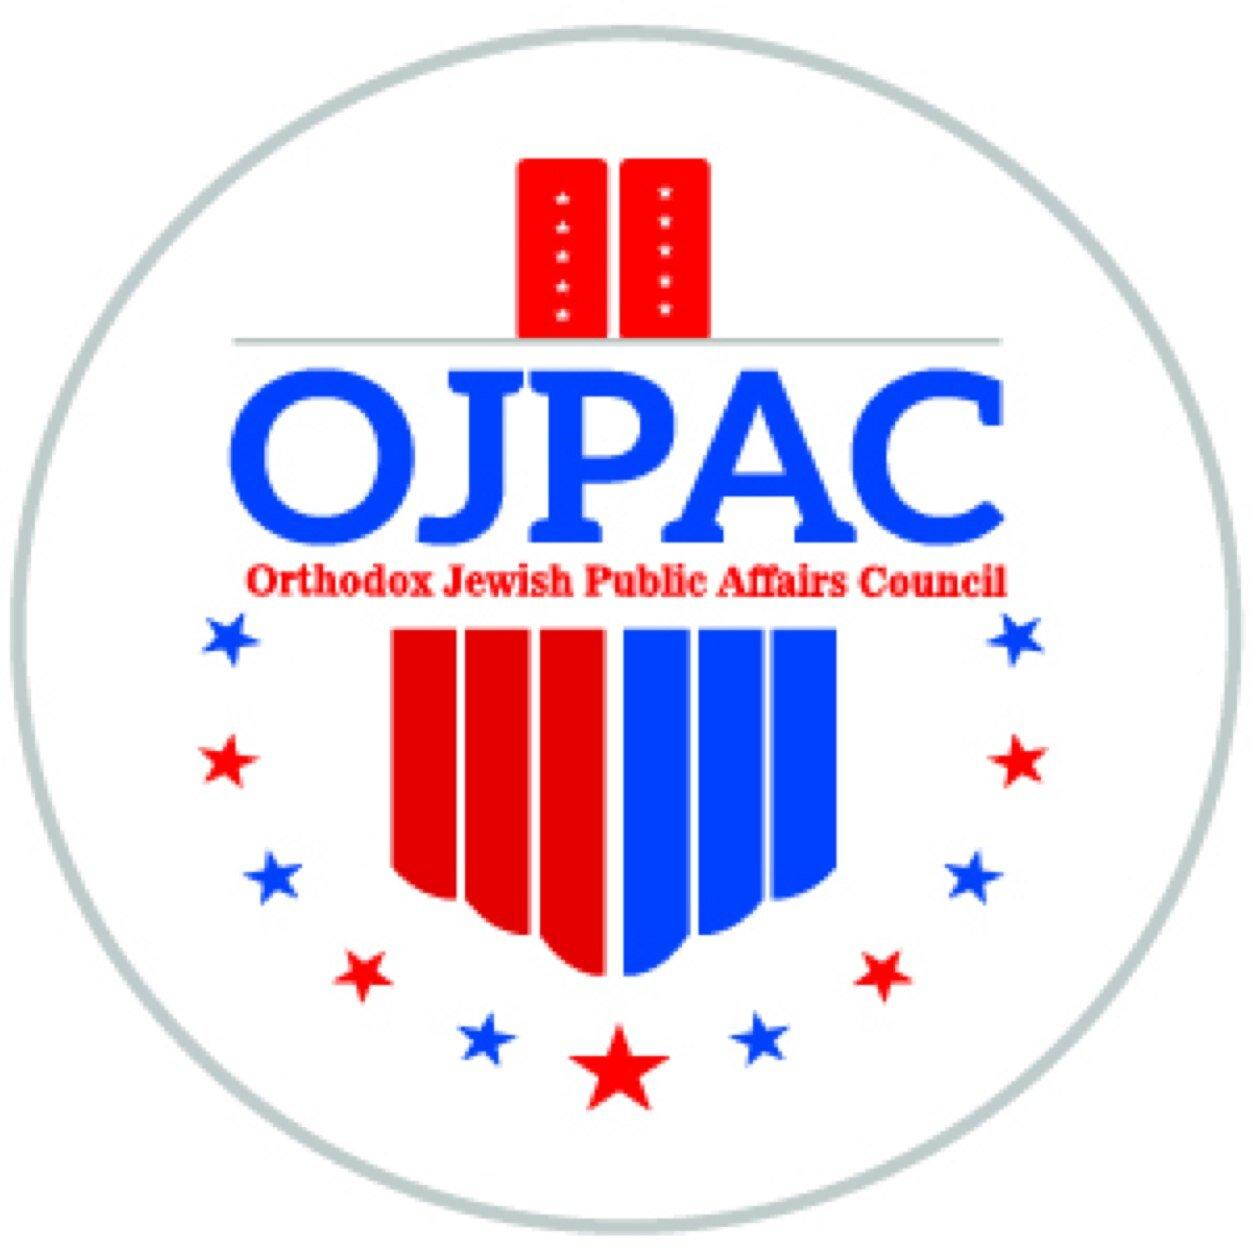 @OJPAC